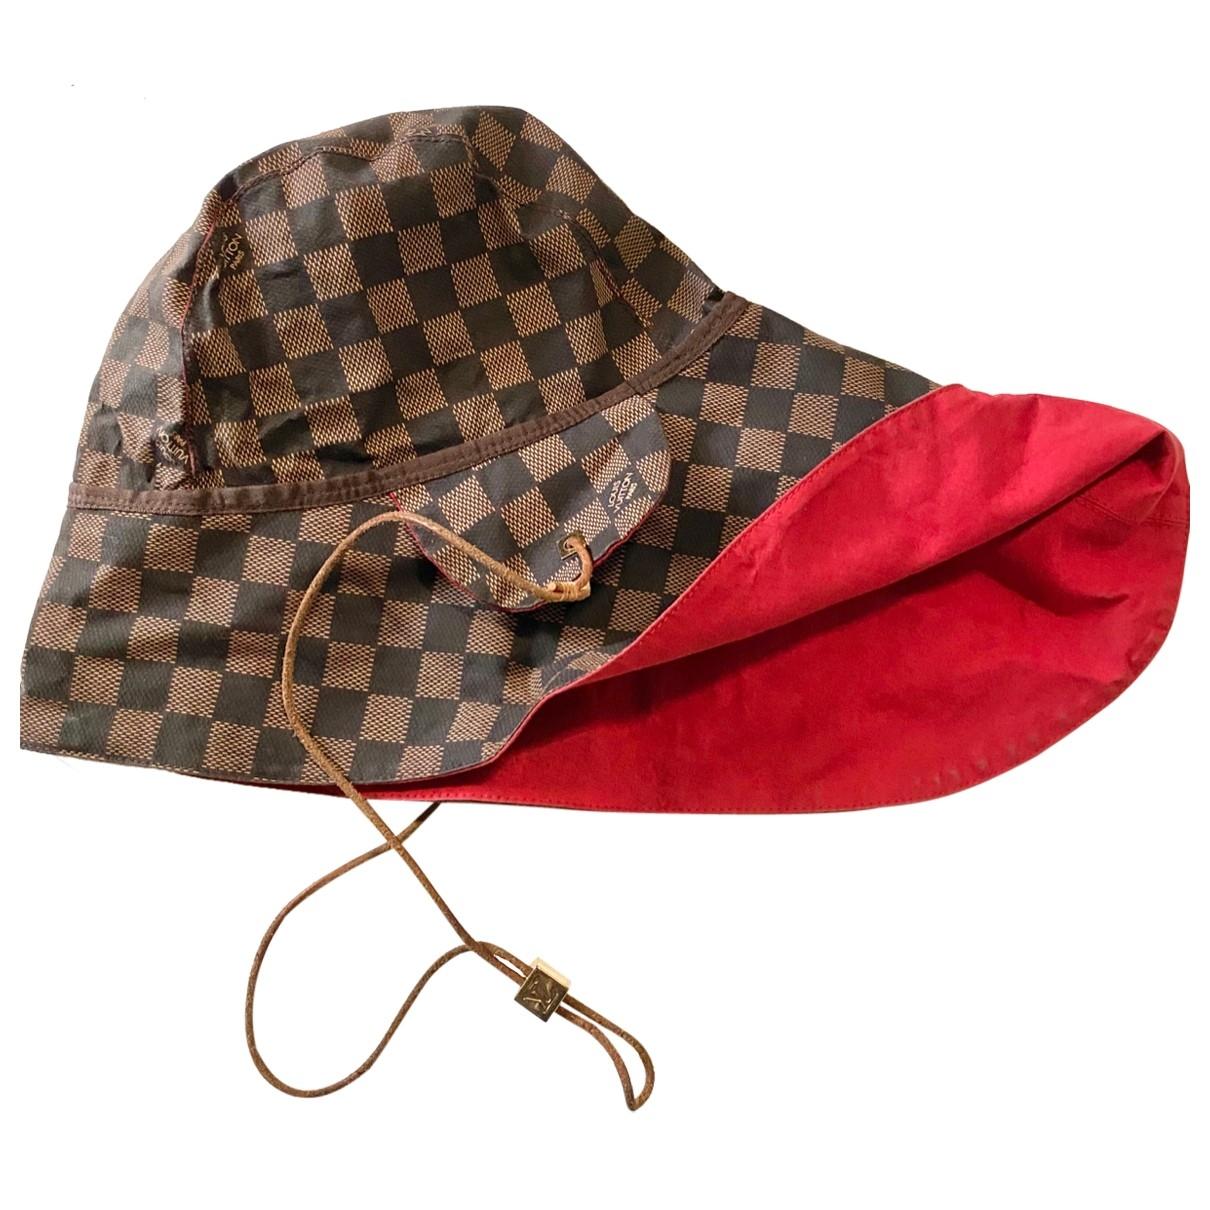 Louis Vuitton \N Cloth hat for Women S International